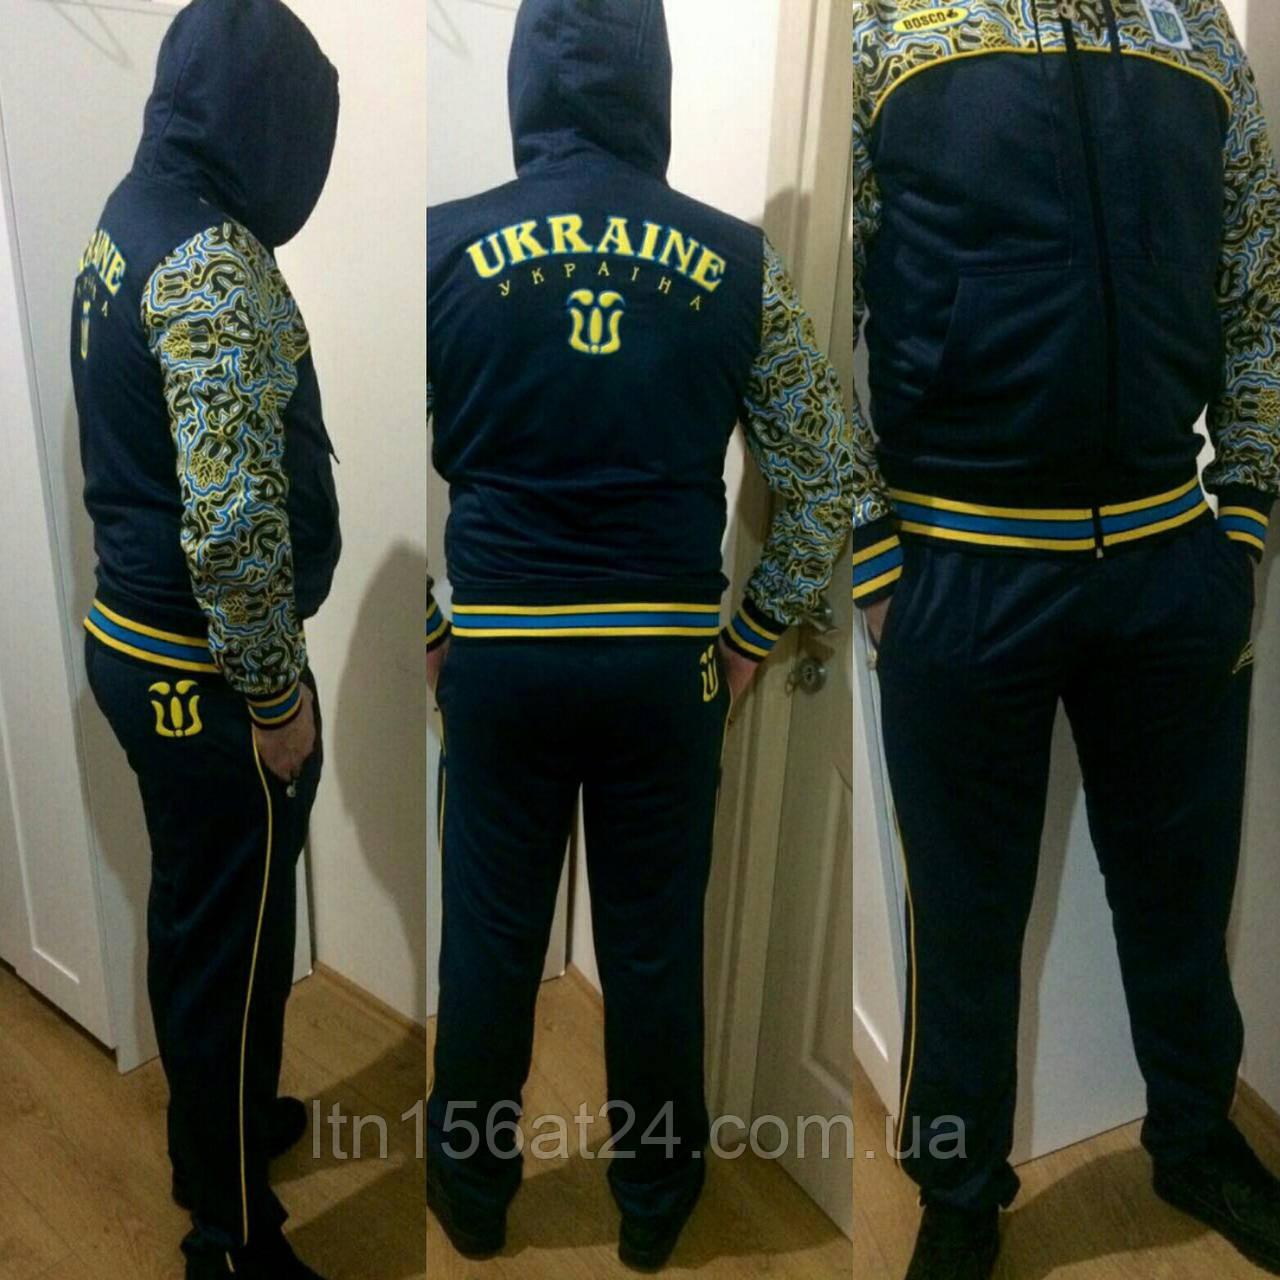 48c2cea1a4dc Спортивные костюмы Bosco Sport Украина мужской - NEWLCD (LCD Экраны) тел. + 380672409835